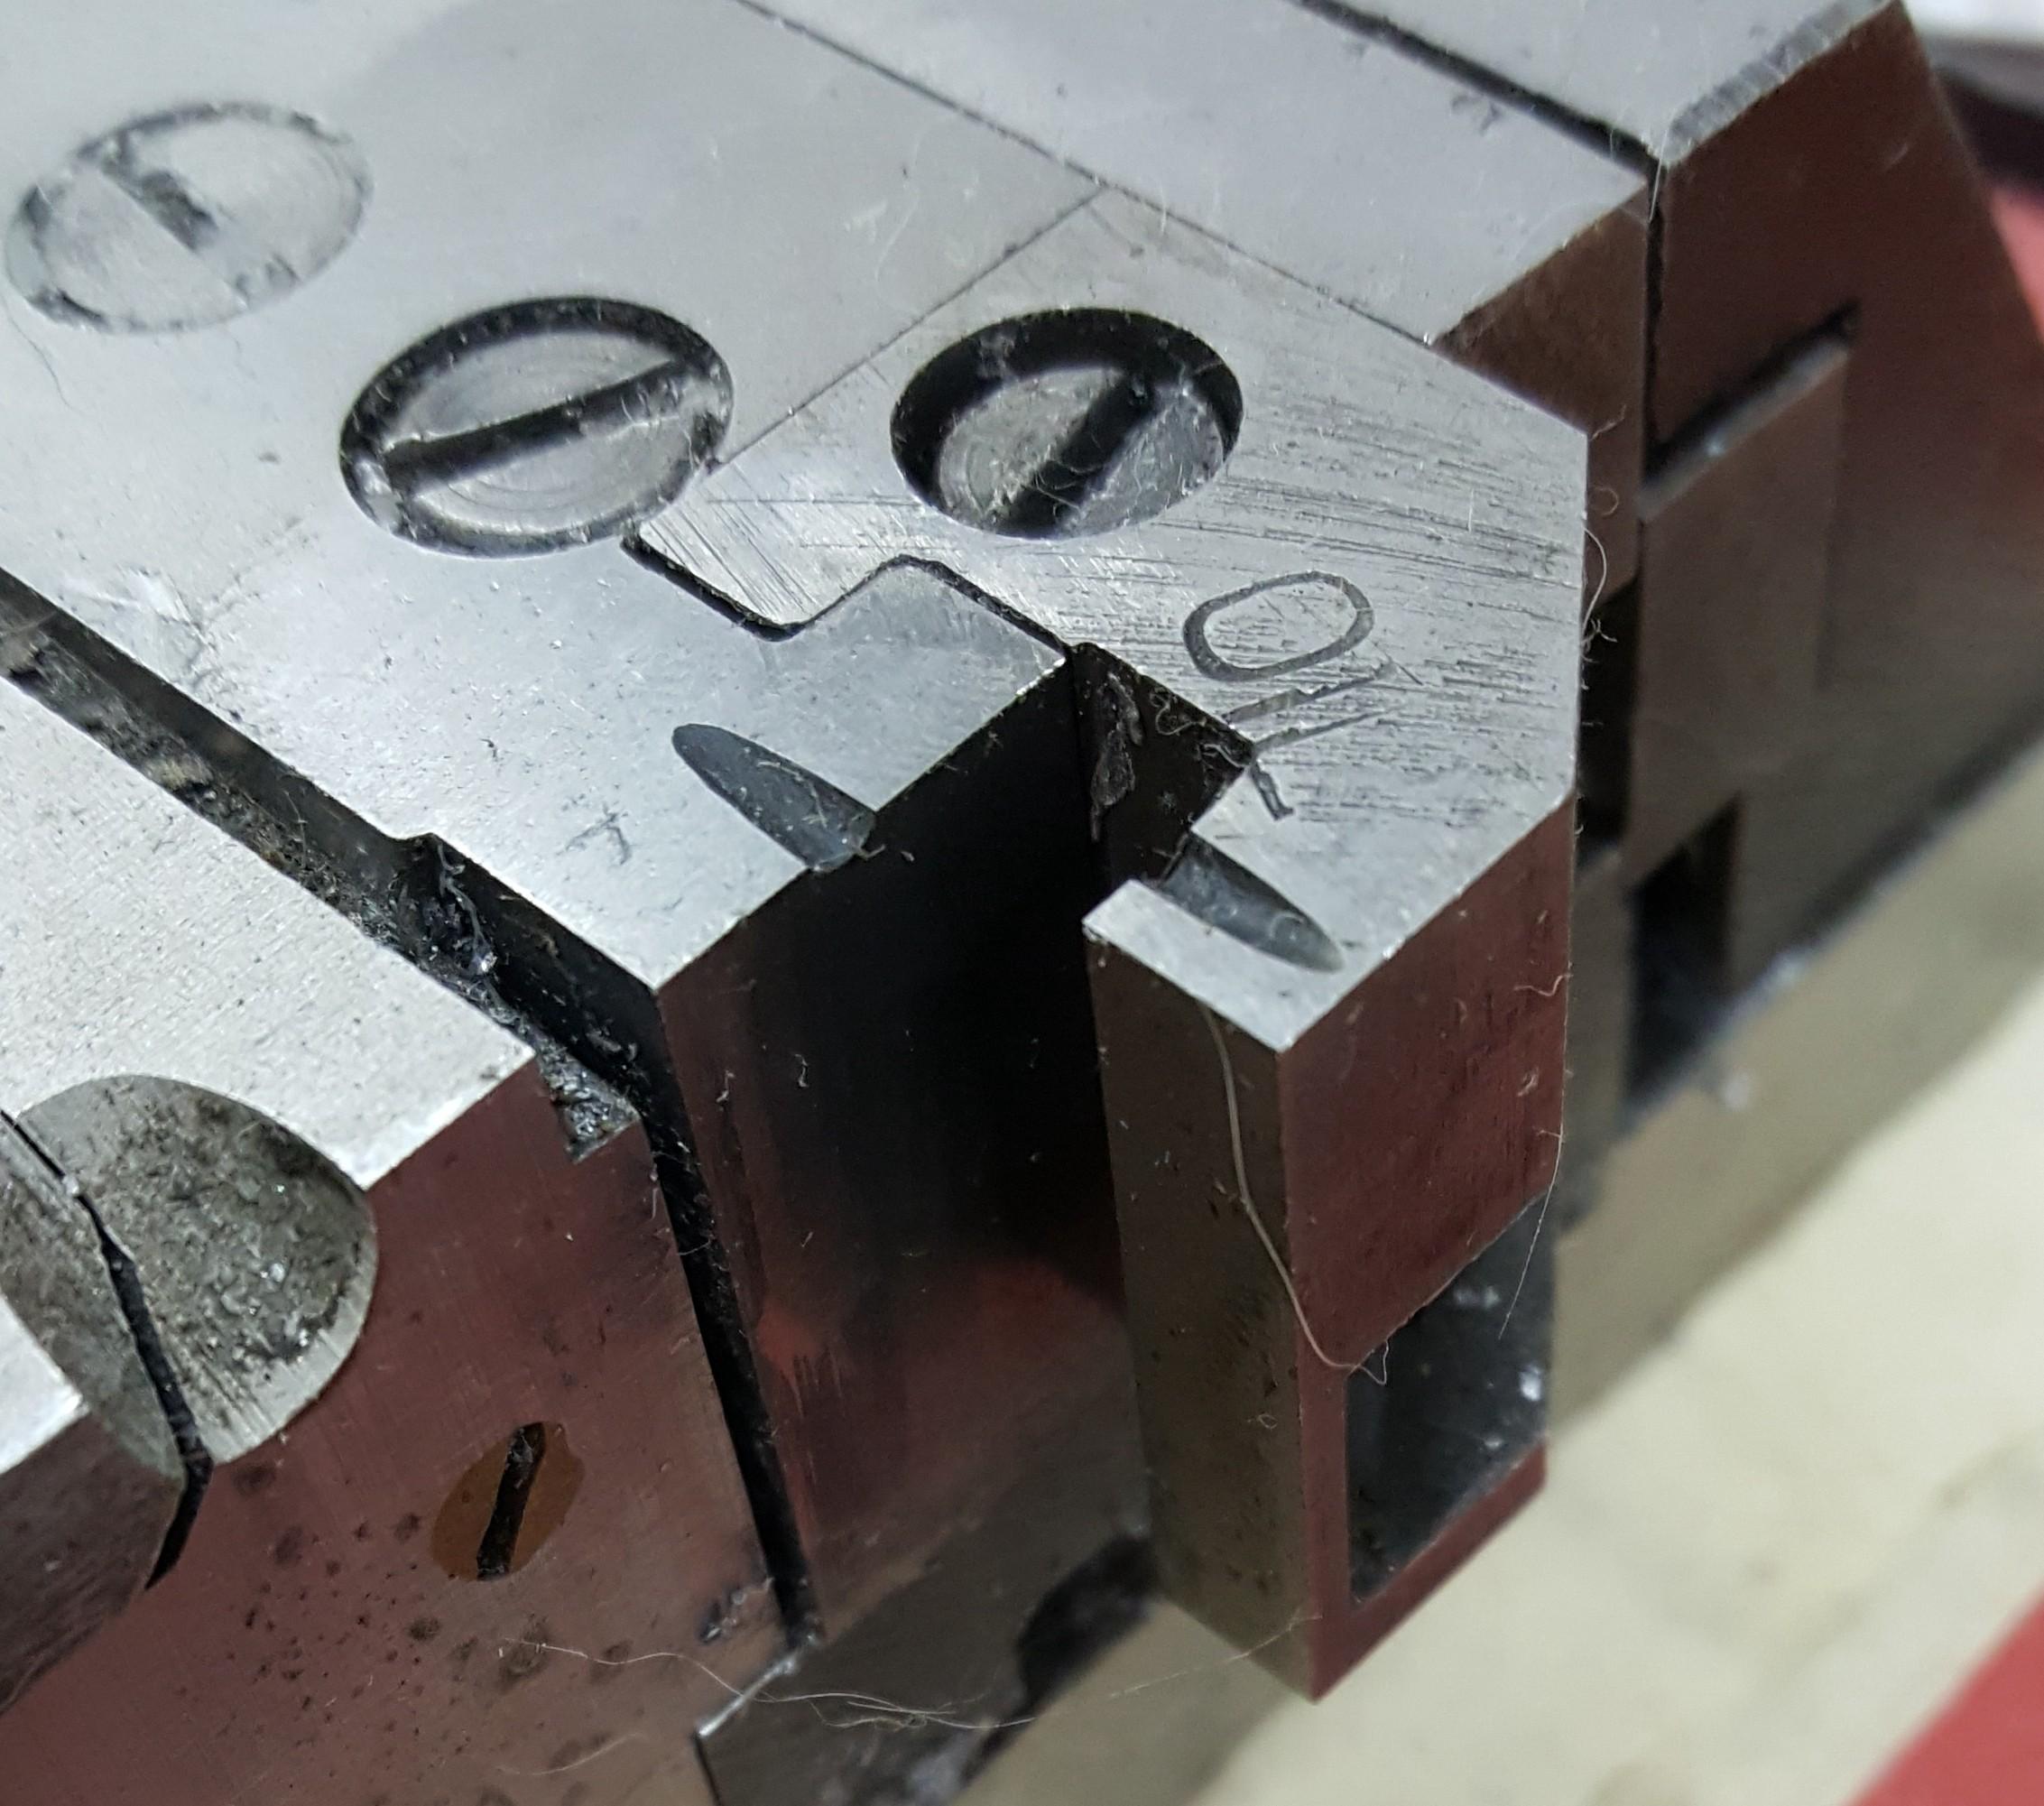 The standard mould coupling hook